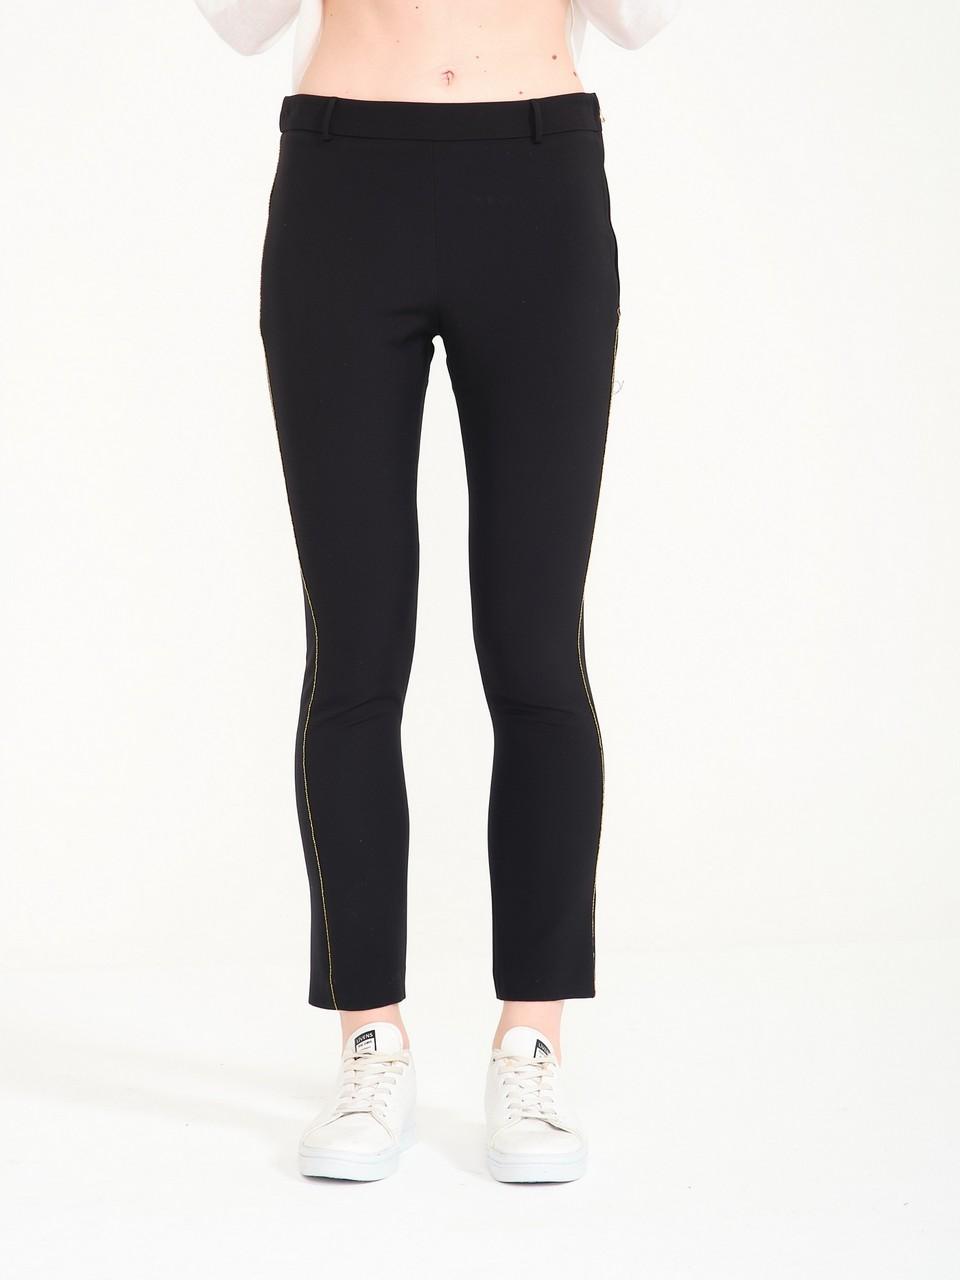 Chain Detailed Elastic Waist Elastic Trousers